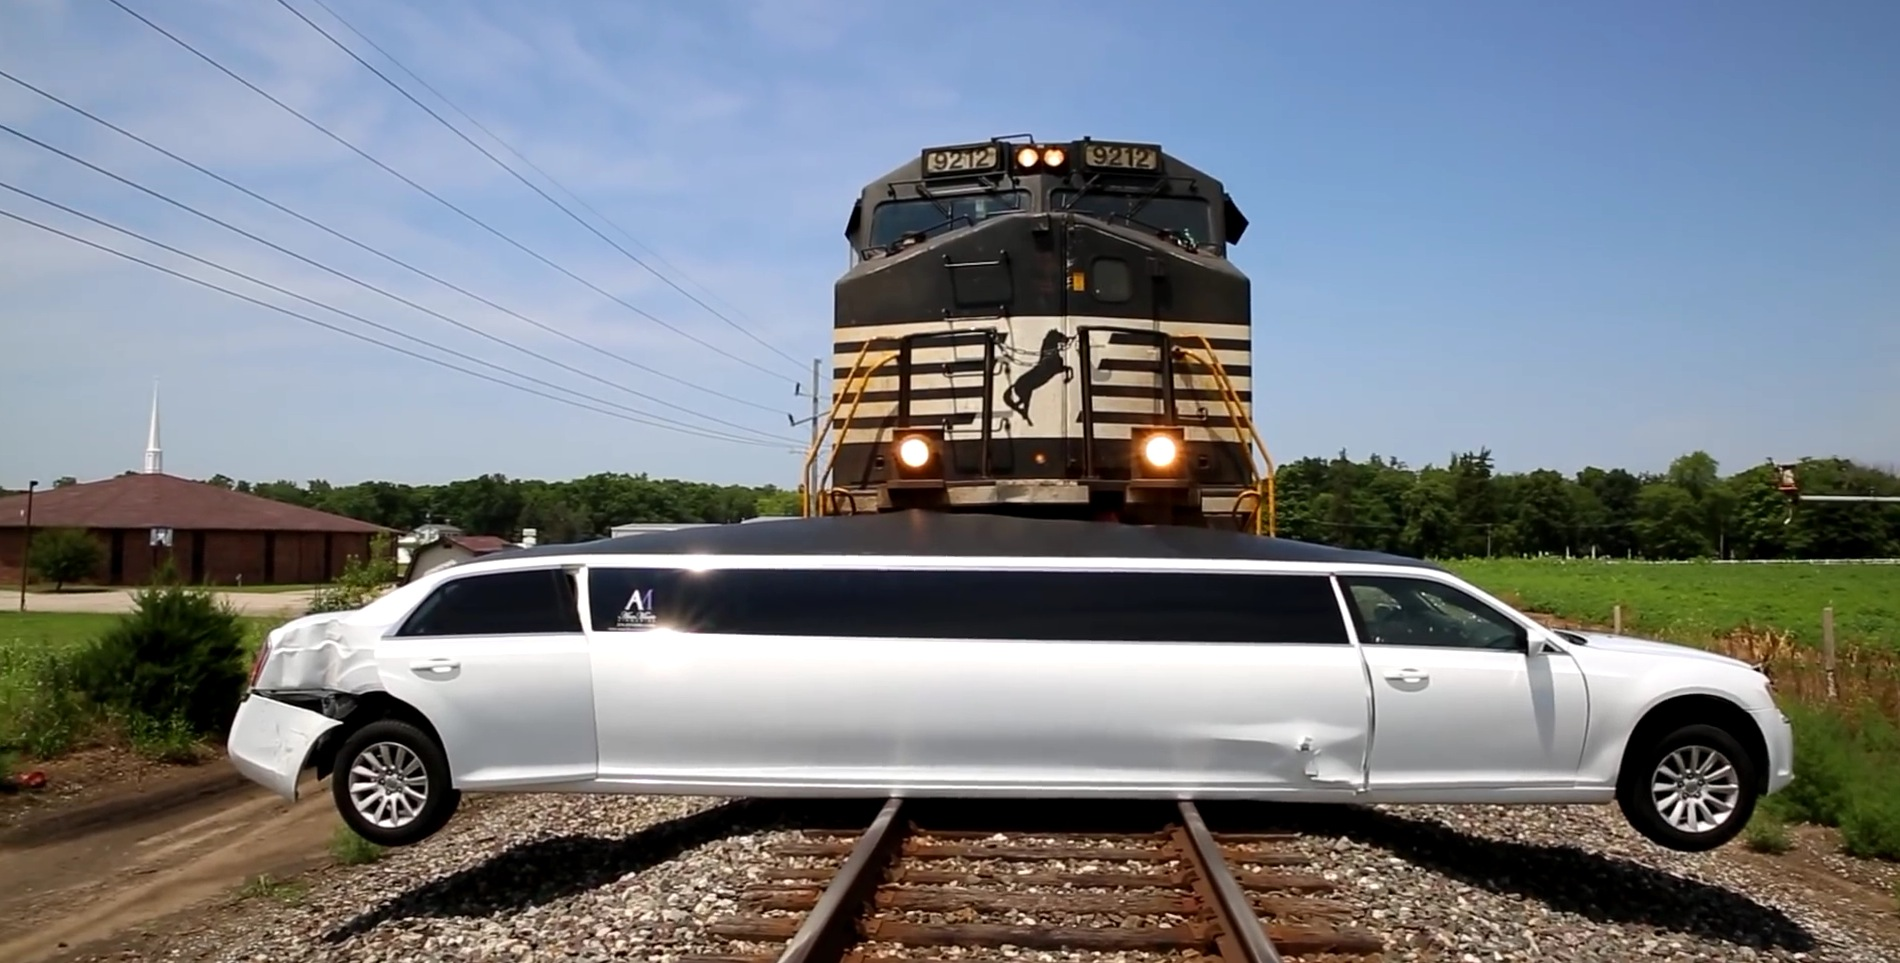 Chrysler Limo Suspended On Tracks Makes For A Brutal Train - Chrysler 300 limo